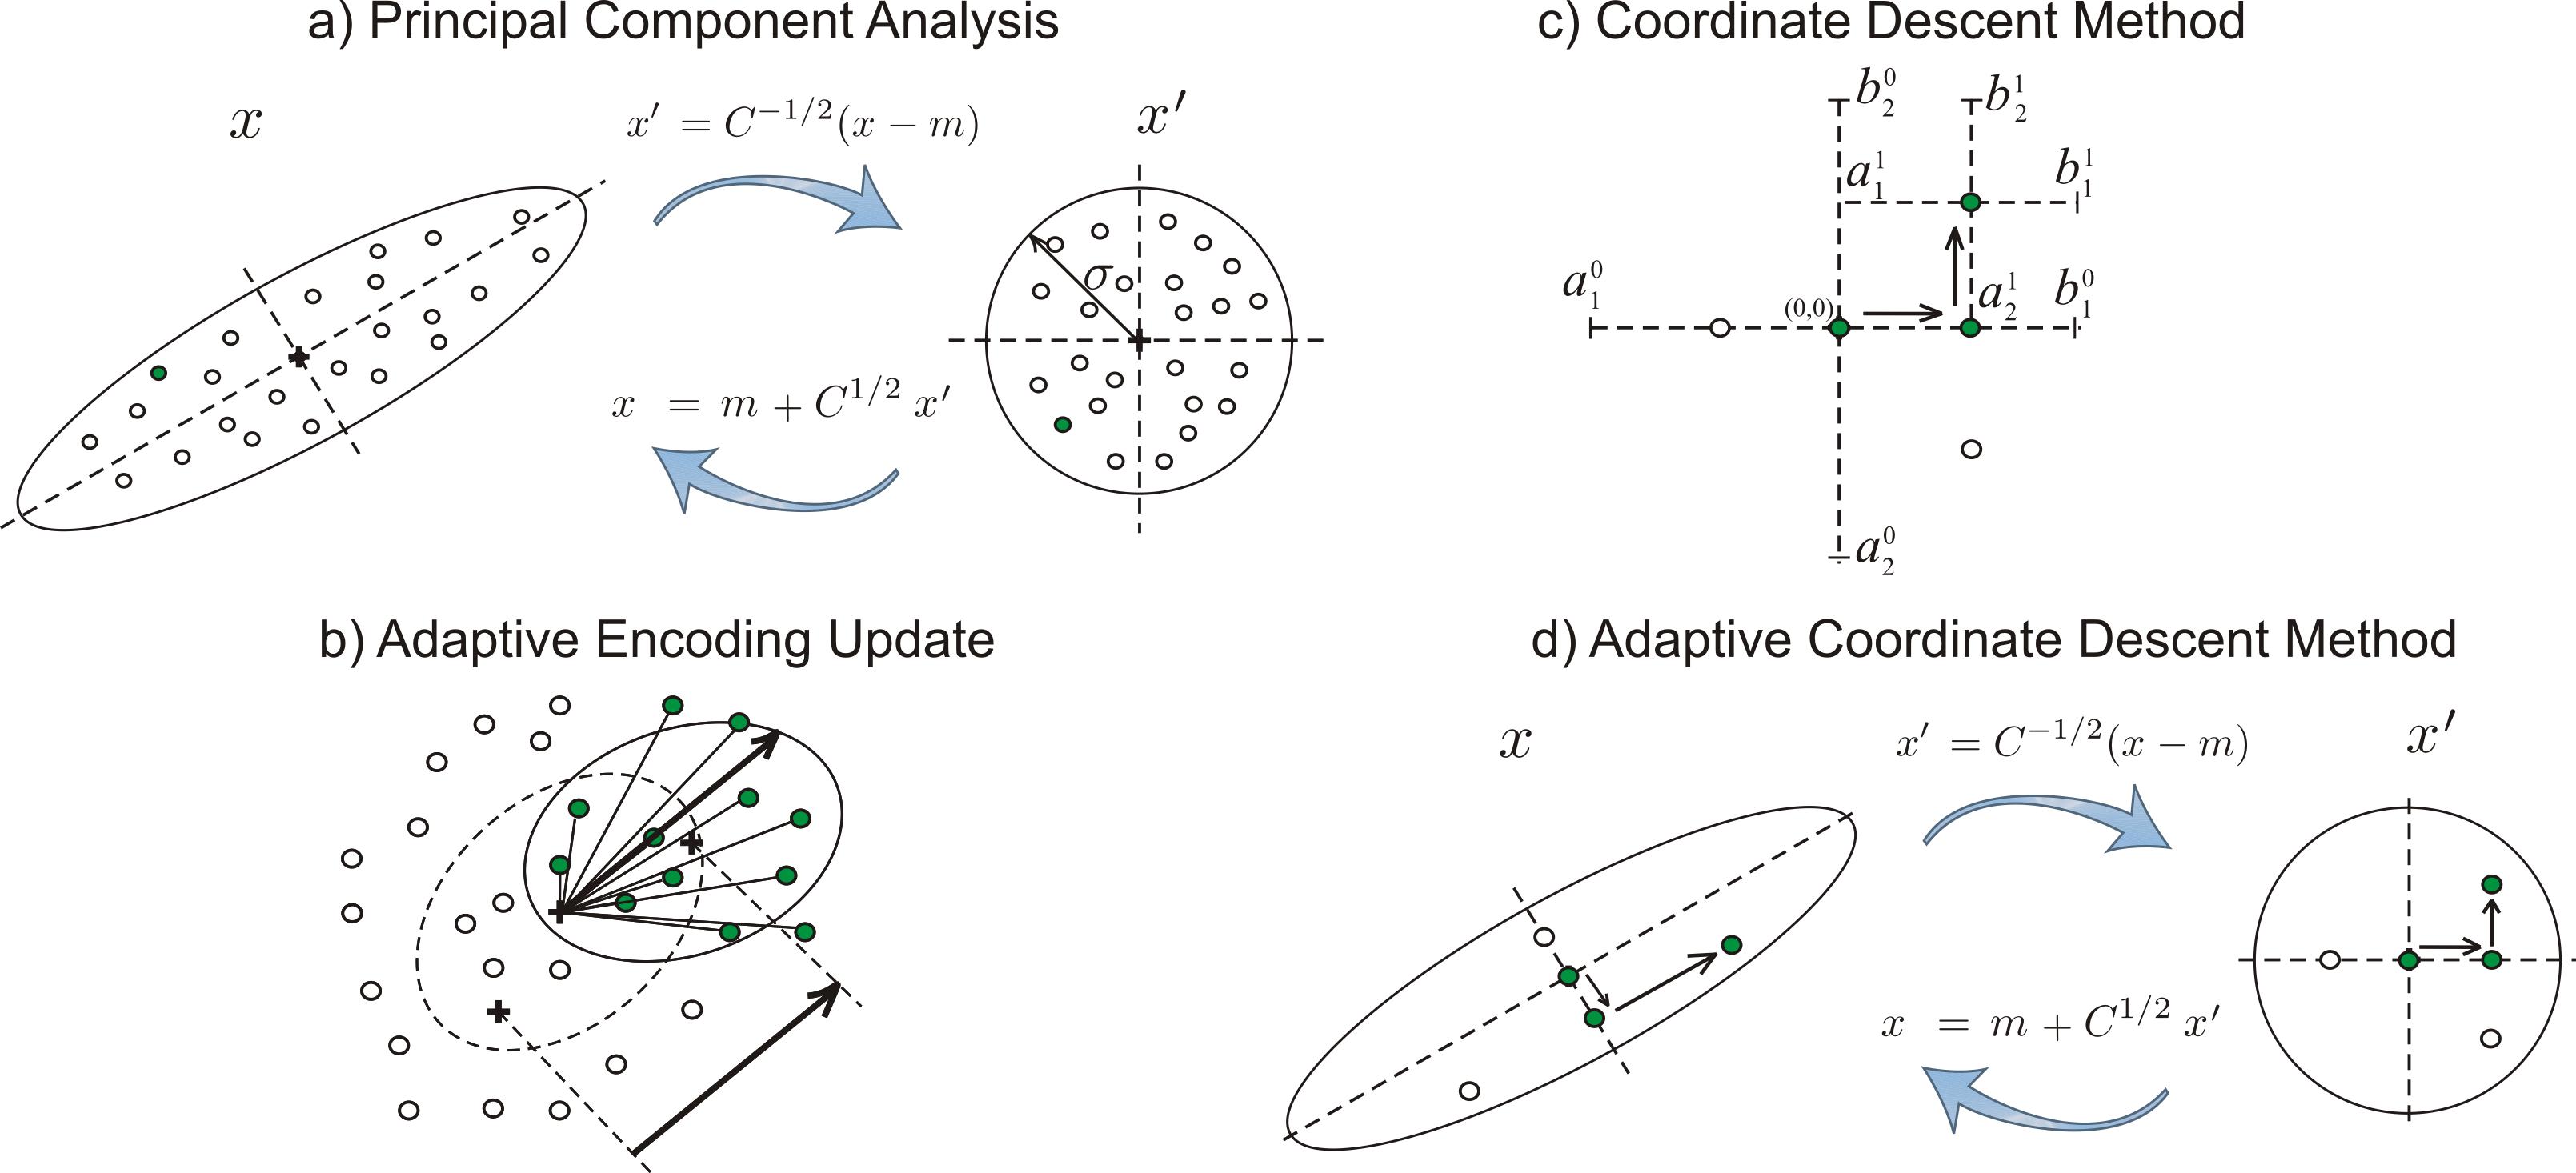 File:Adaptive Coordinate Descent illustration.png